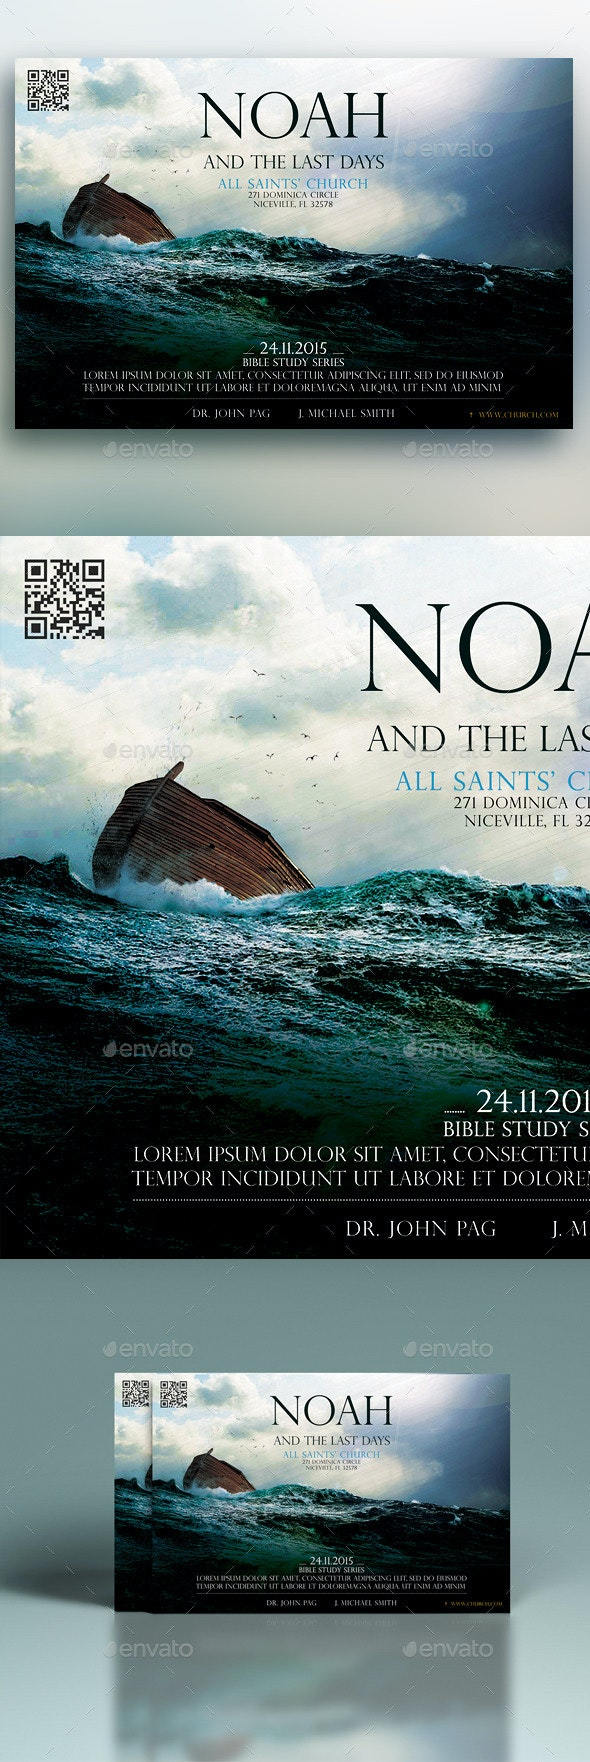 Noah And The Last Days - Church Flyers